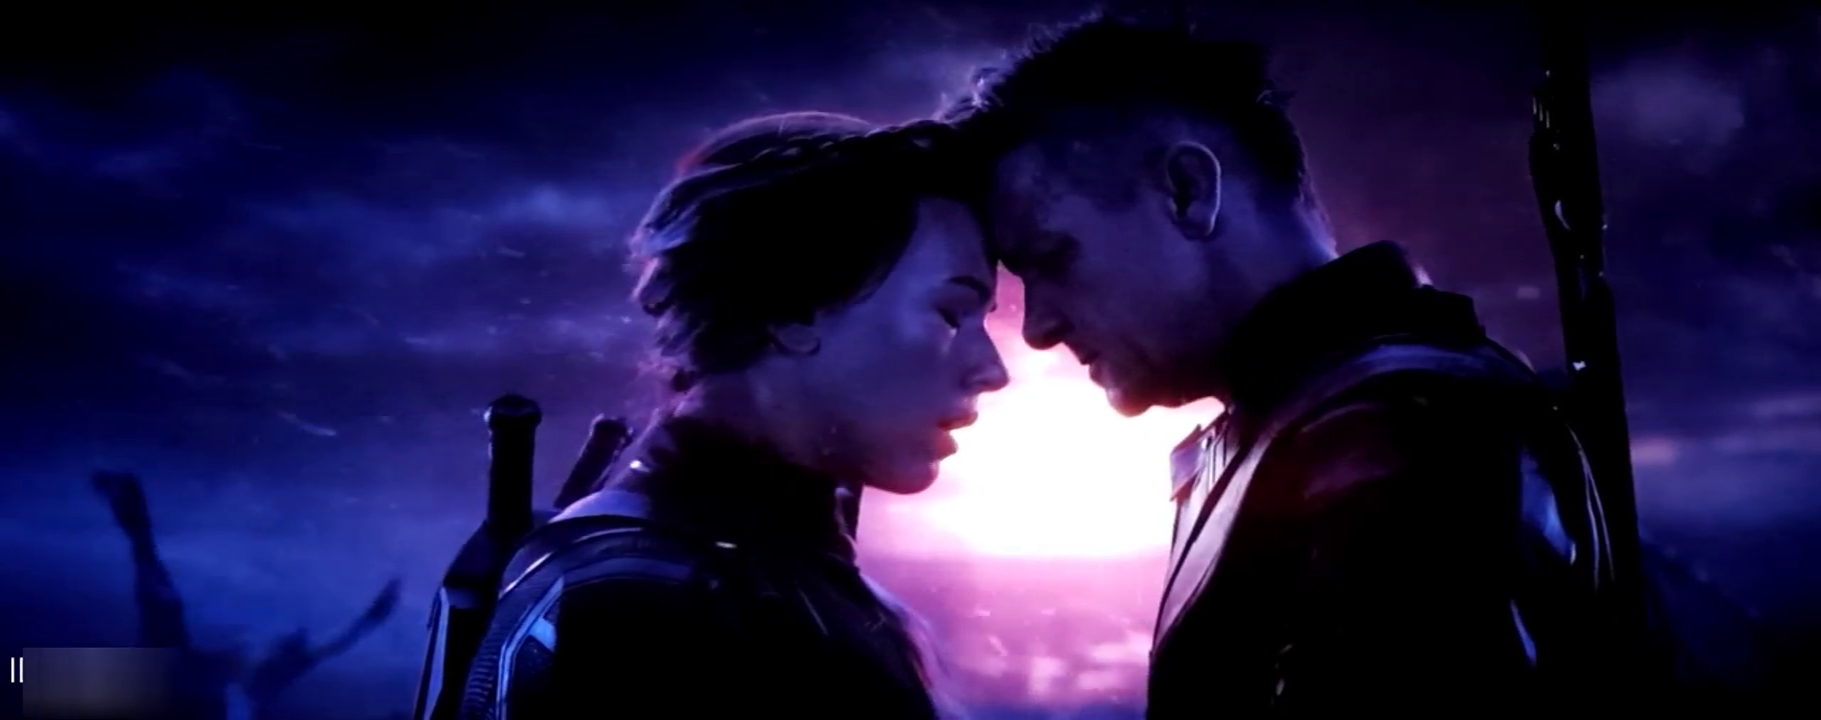 Avengers Endgame (2019) 720p HDCAM-xBay